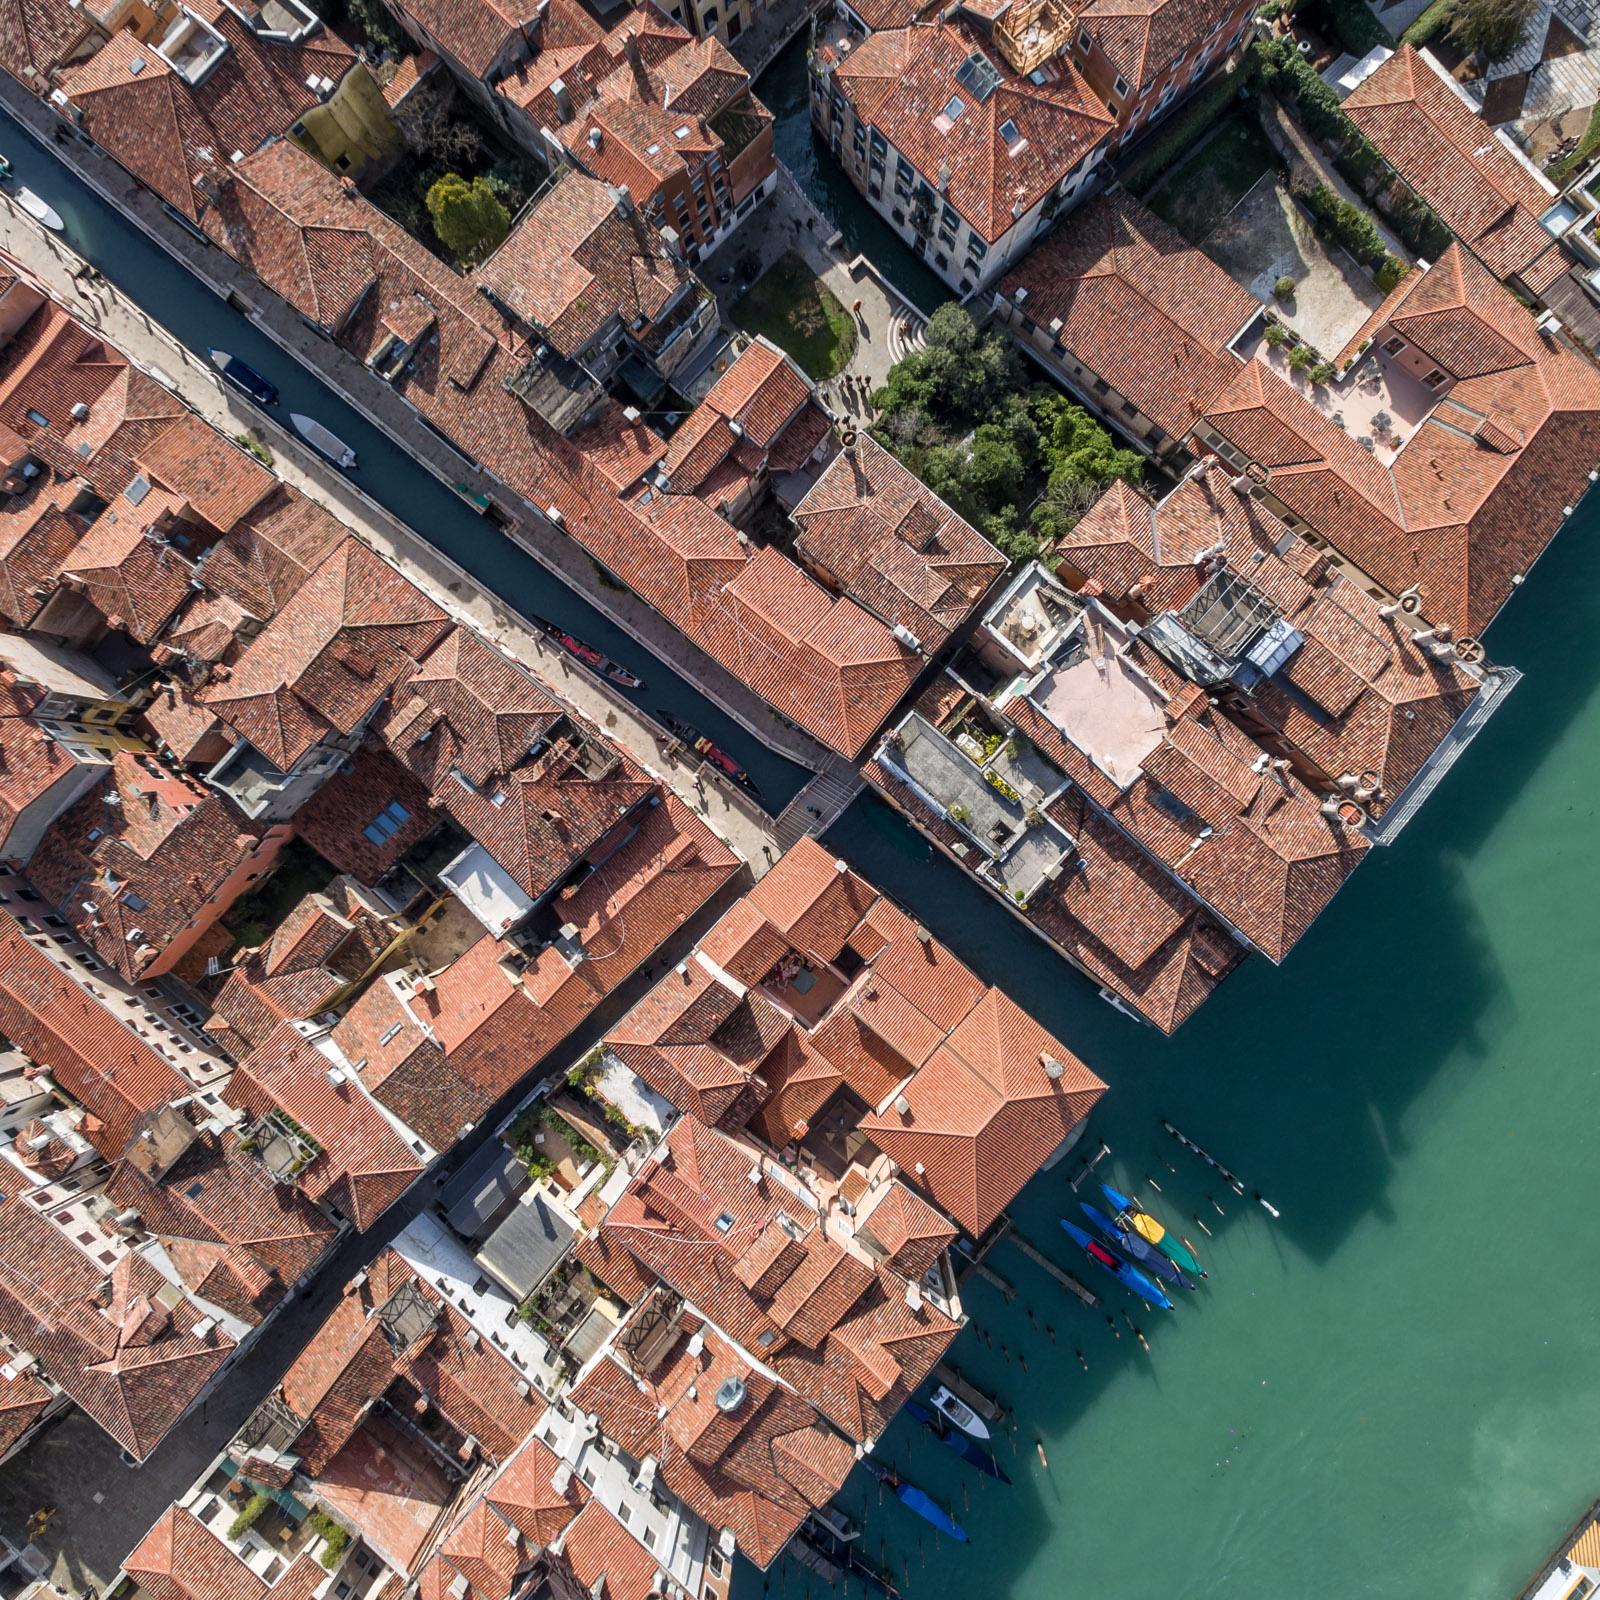 Venice_E10_v1.jpg